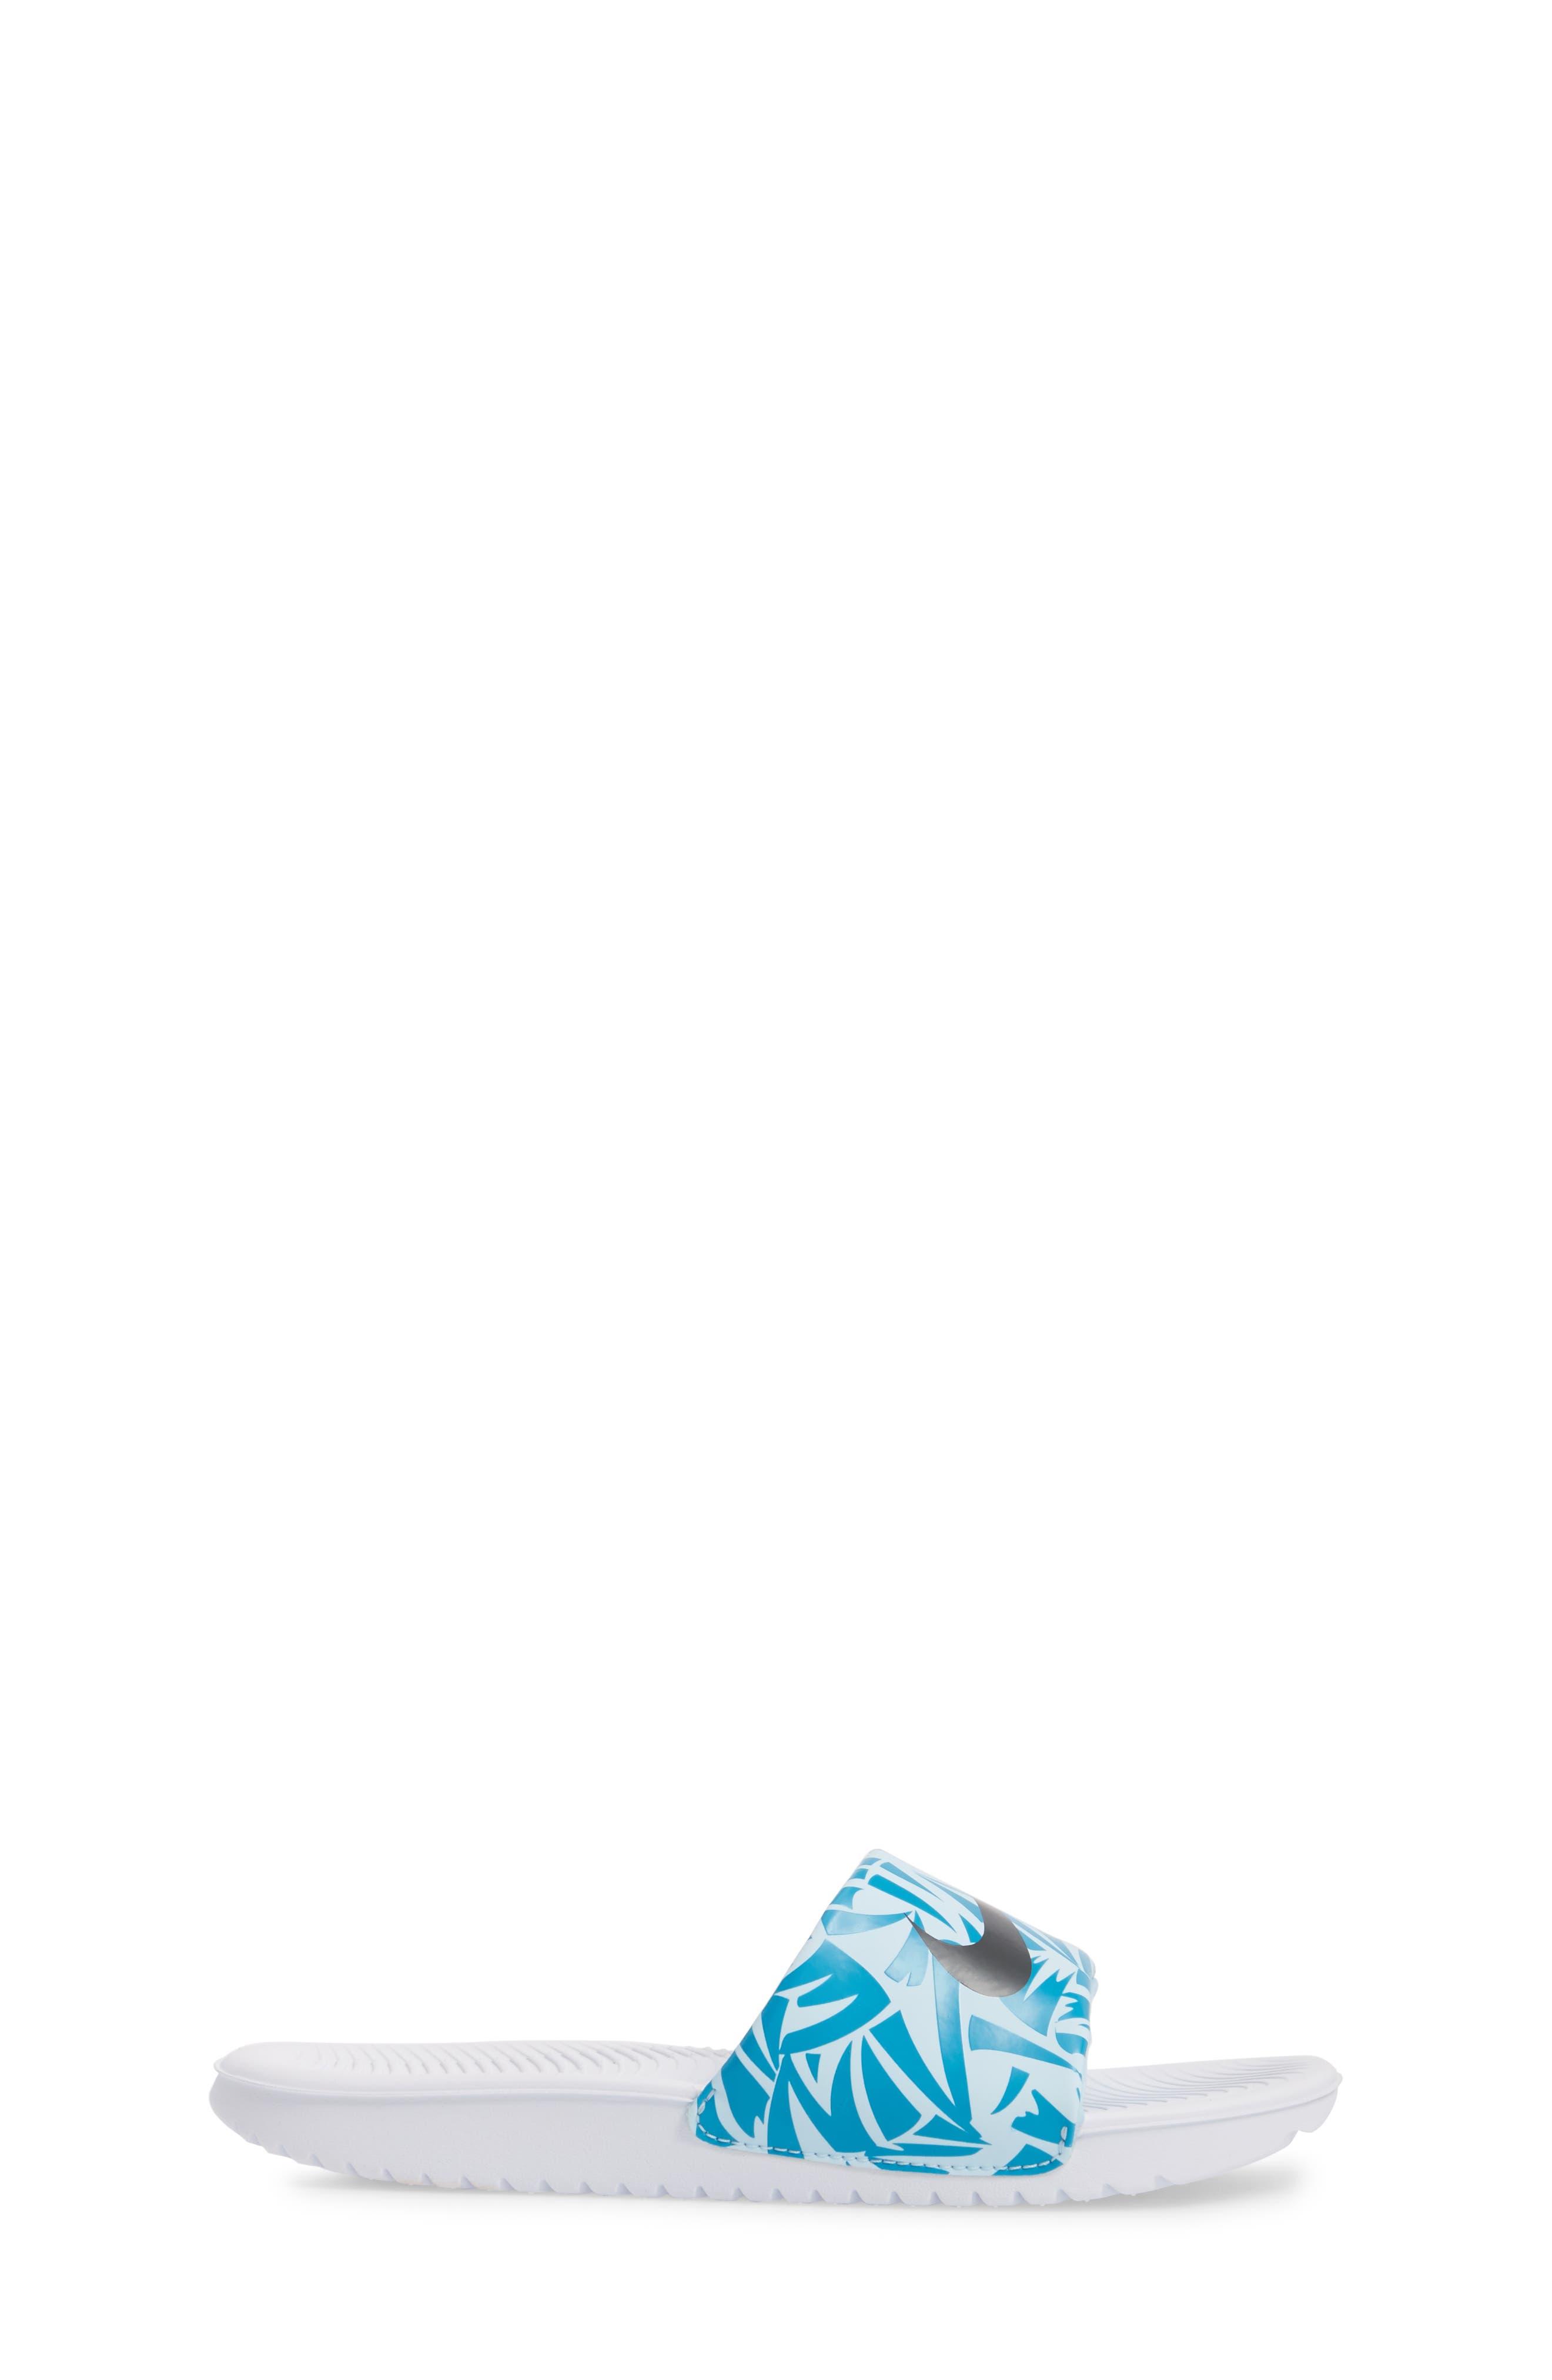 'Kawa' Print Slide Sandal,                             Alternate thumbnail 12, color,